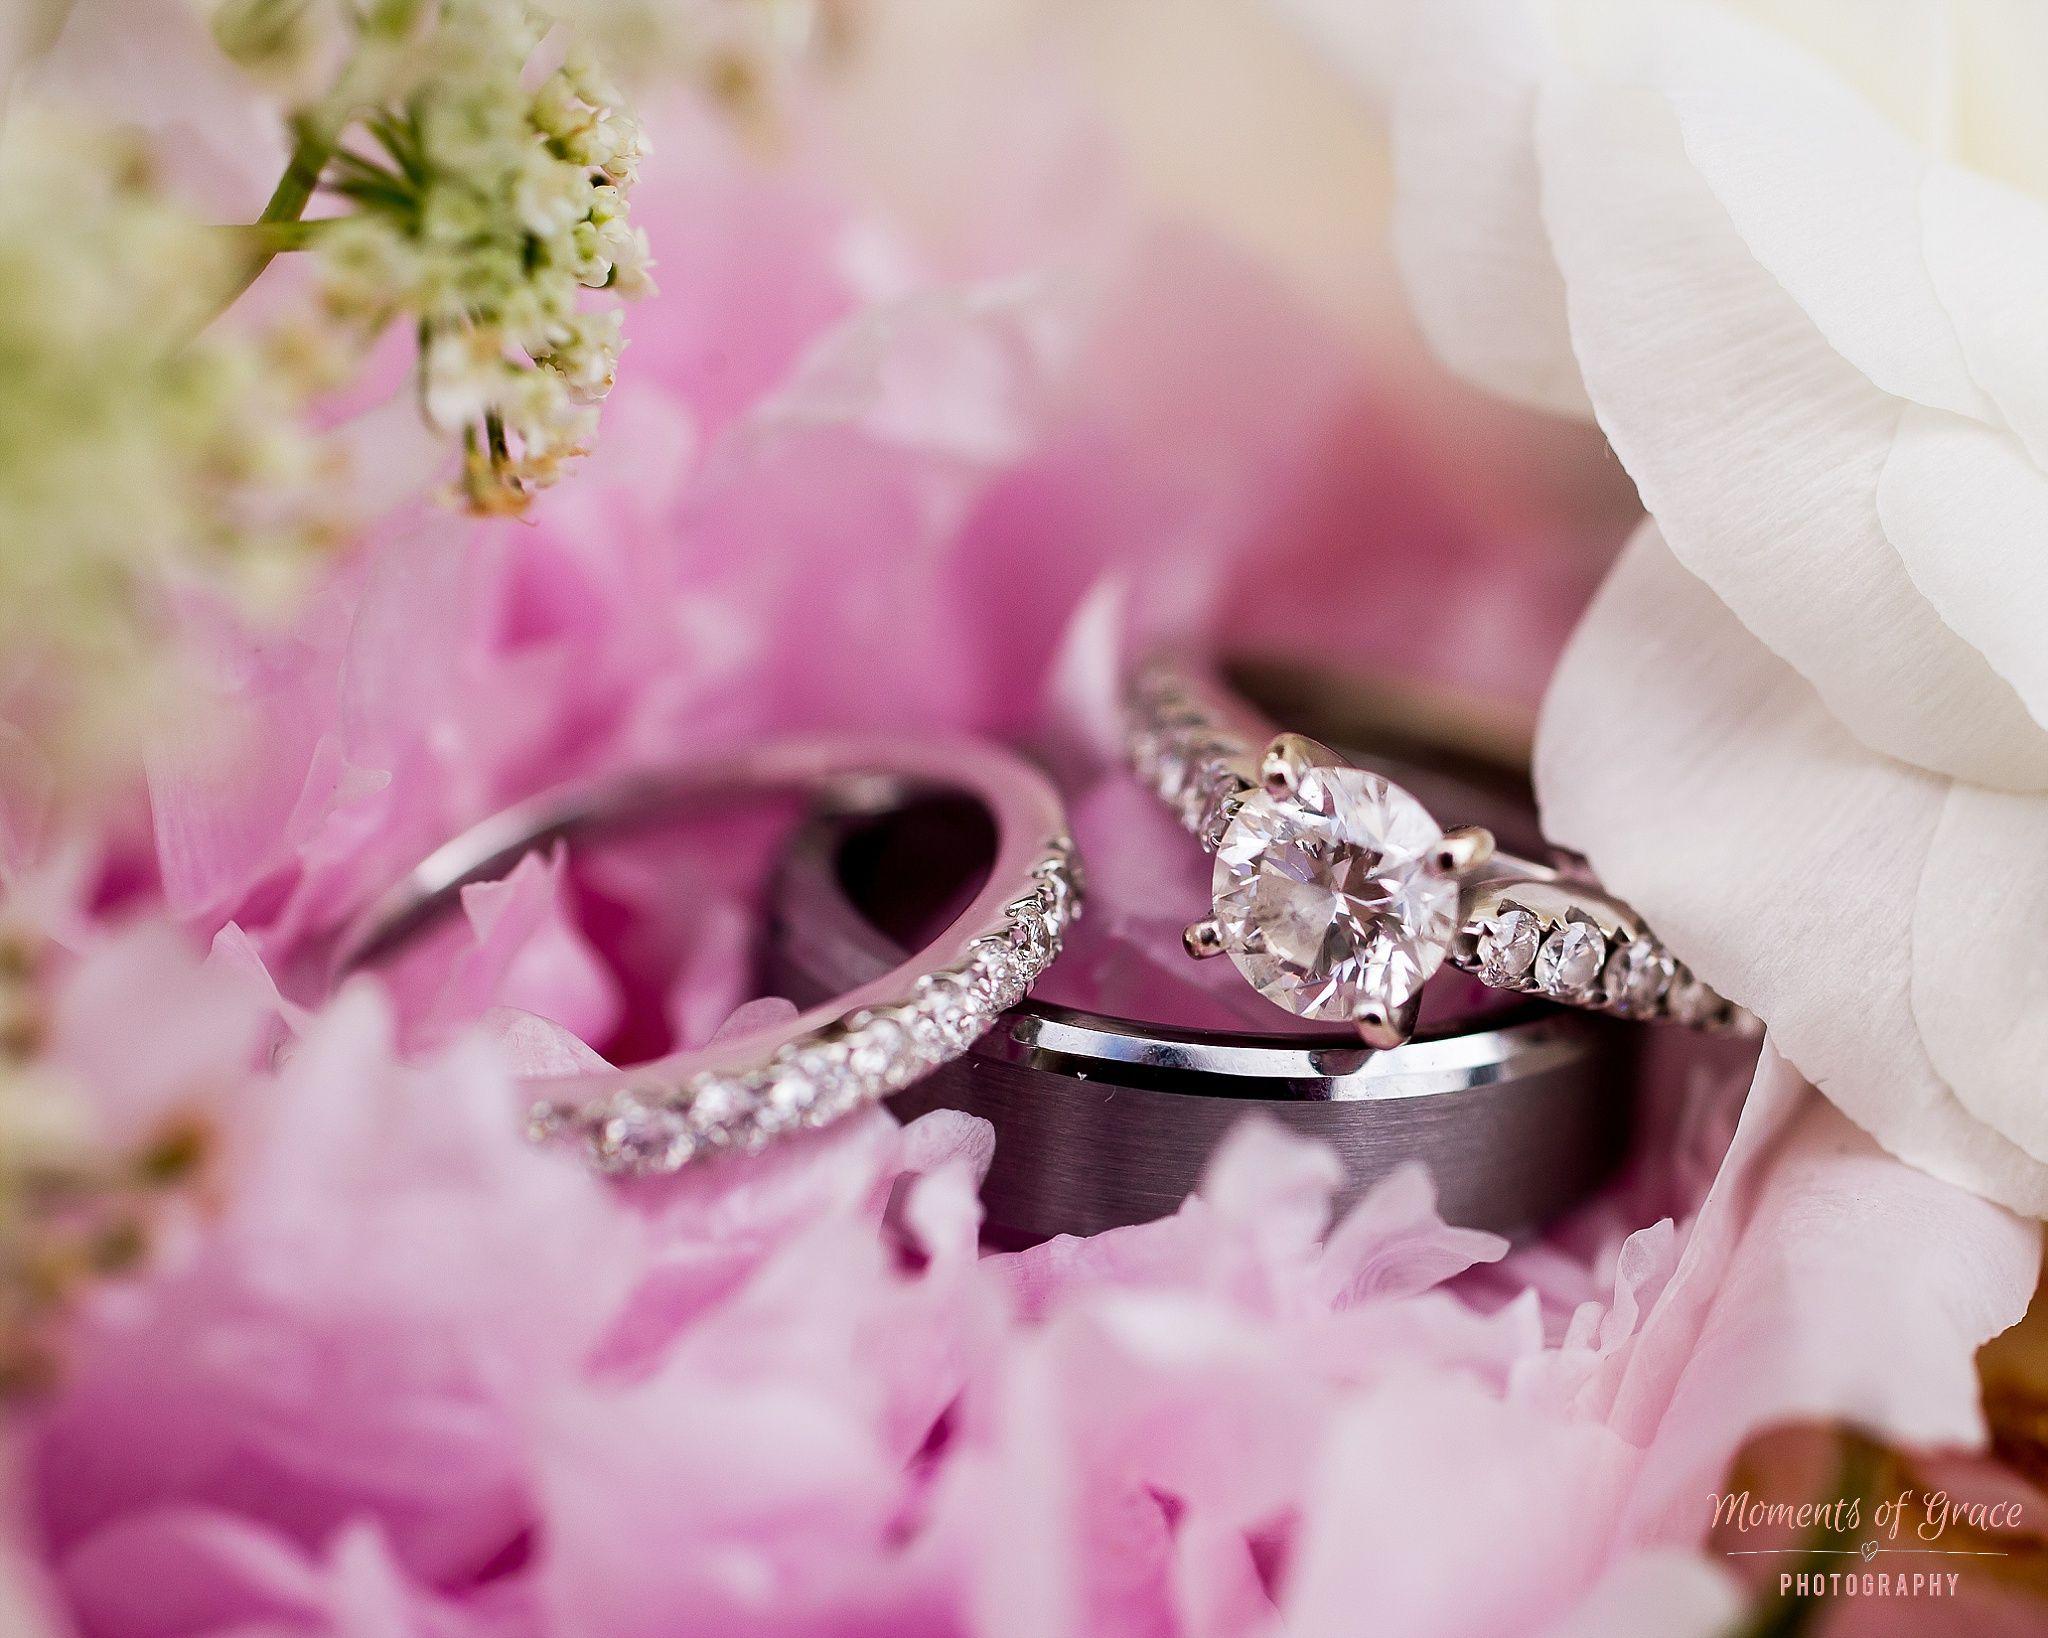 wedding photography, KY wedding, spring wedding, Moments of Grace ...